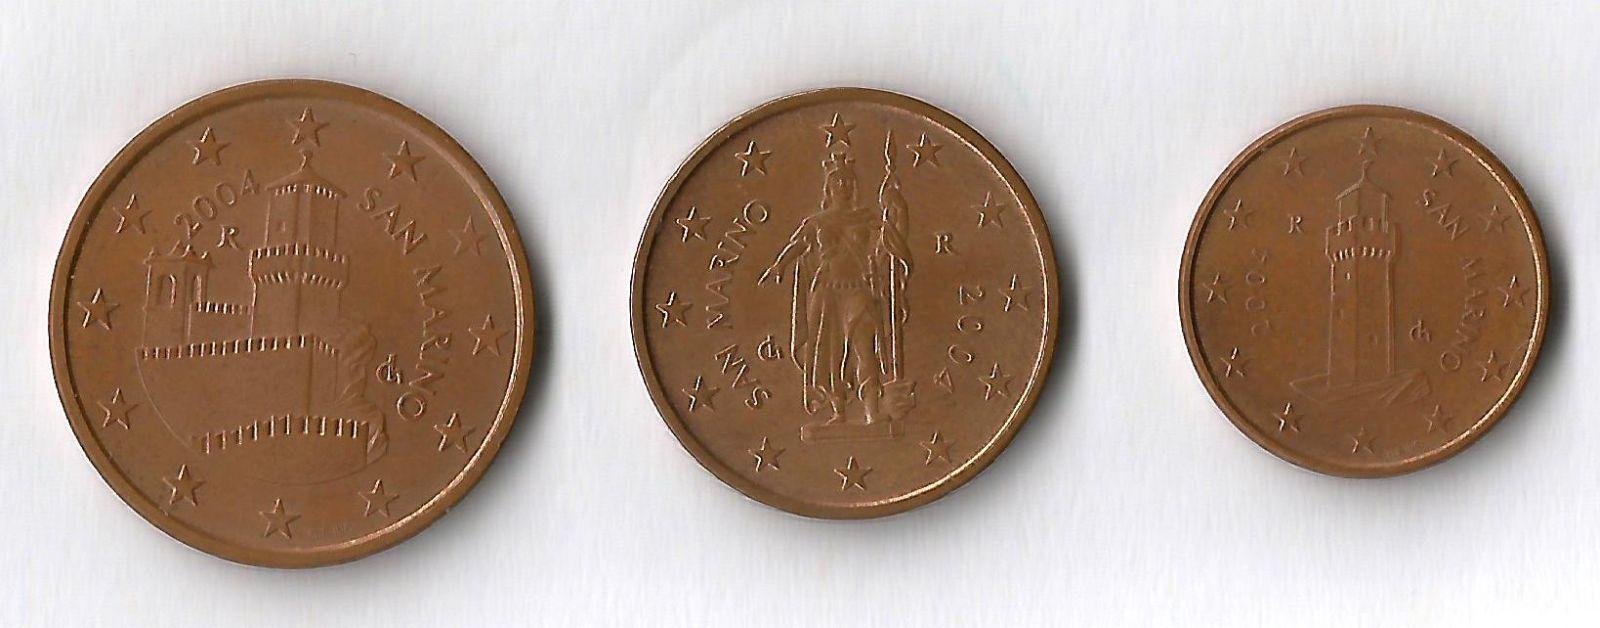 san marino 5,2,1 cent.jpg